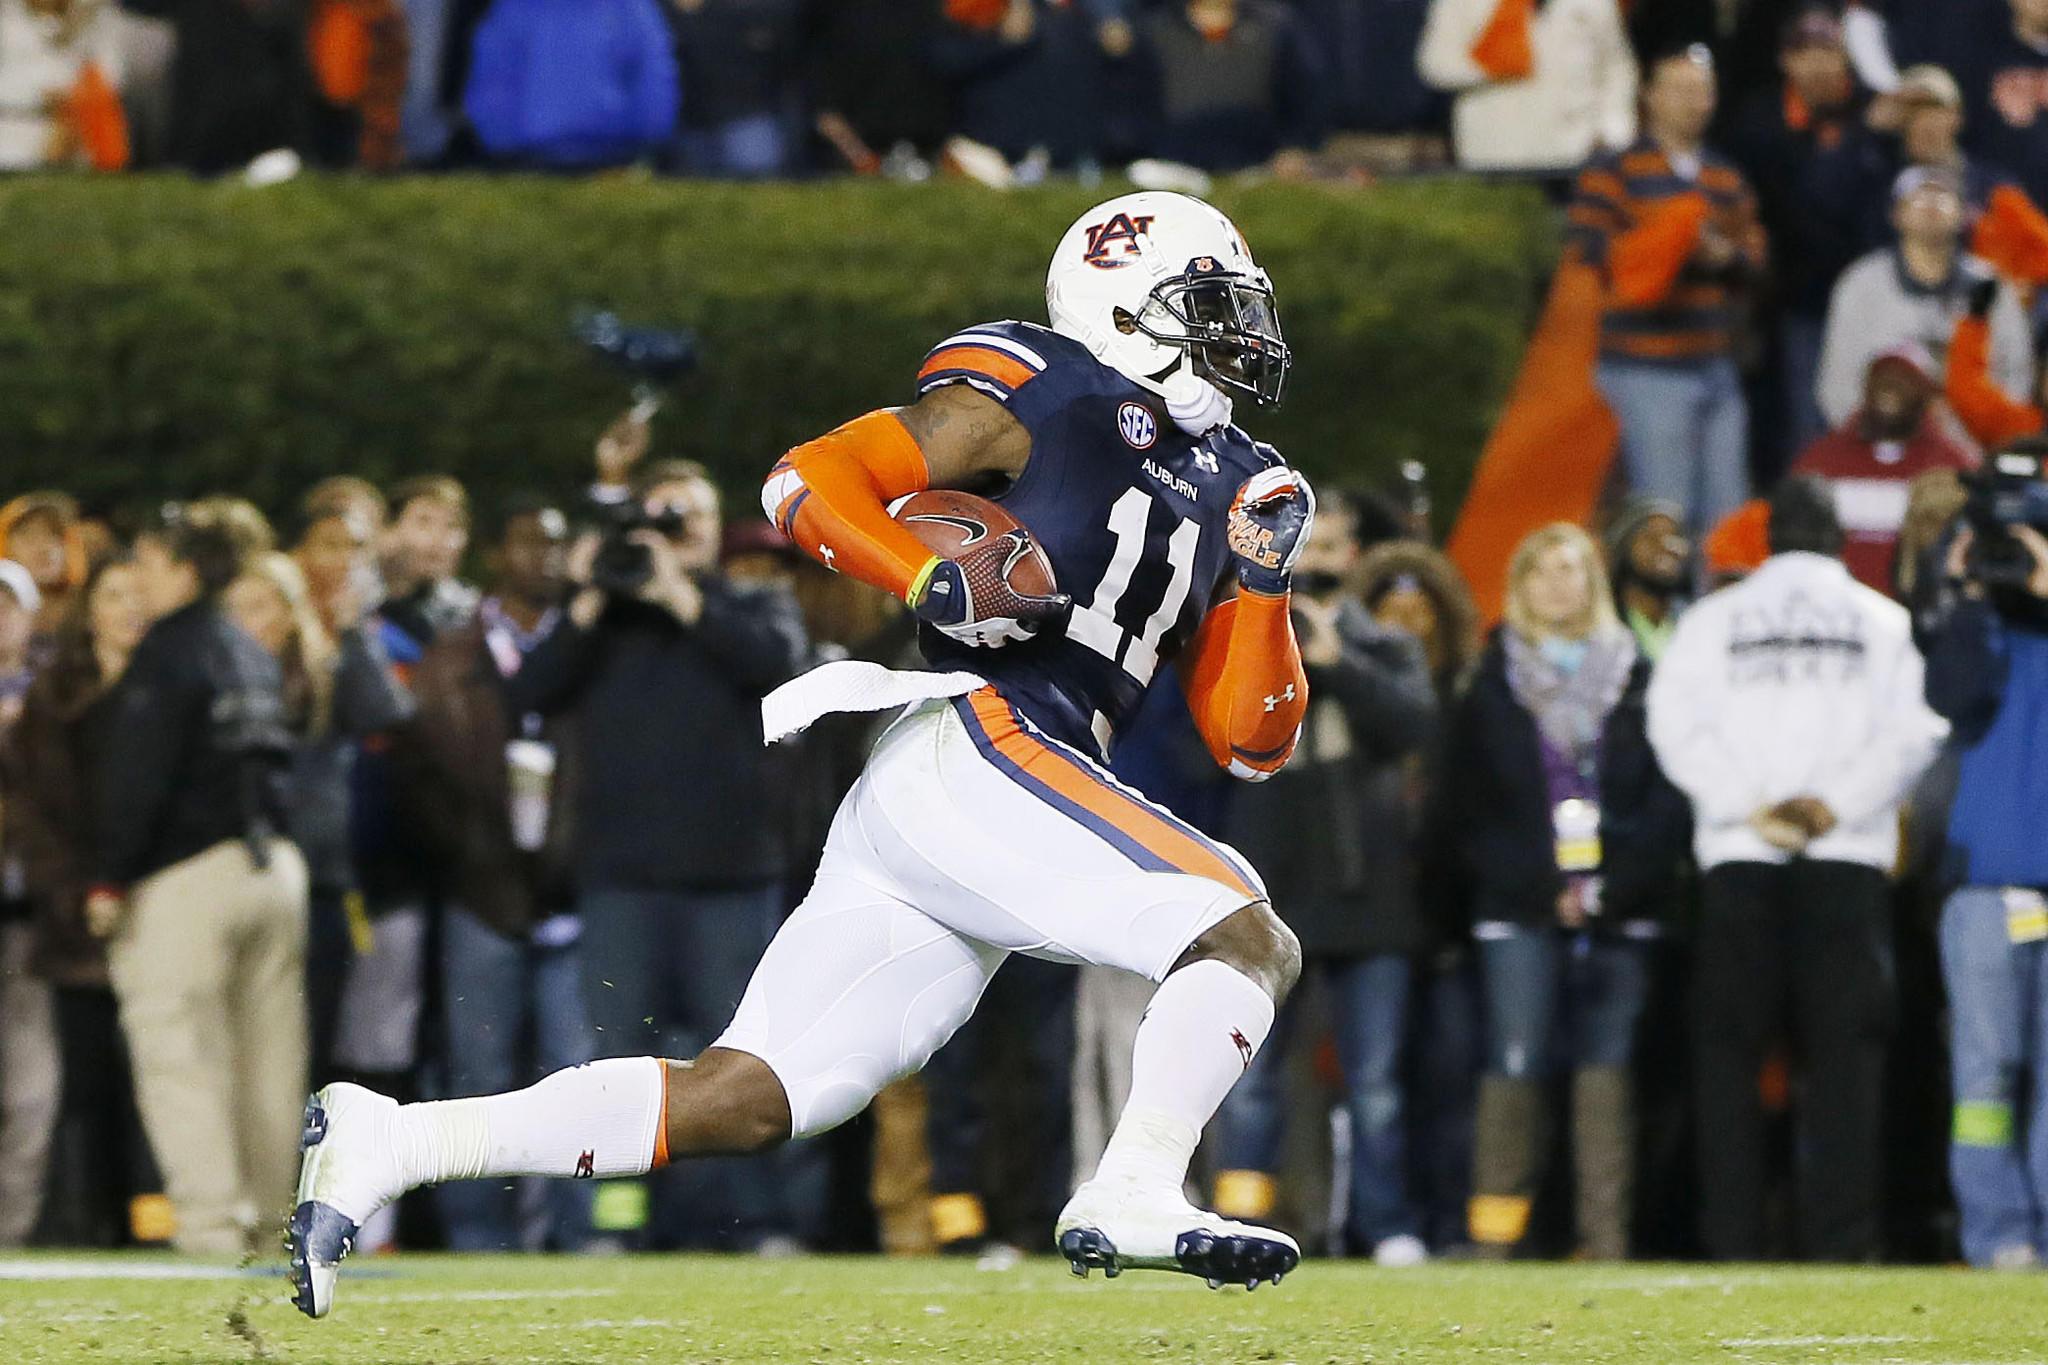 Auburn's Chris Davis returns a missed field goal for the winning touchdown vs. Alabama.